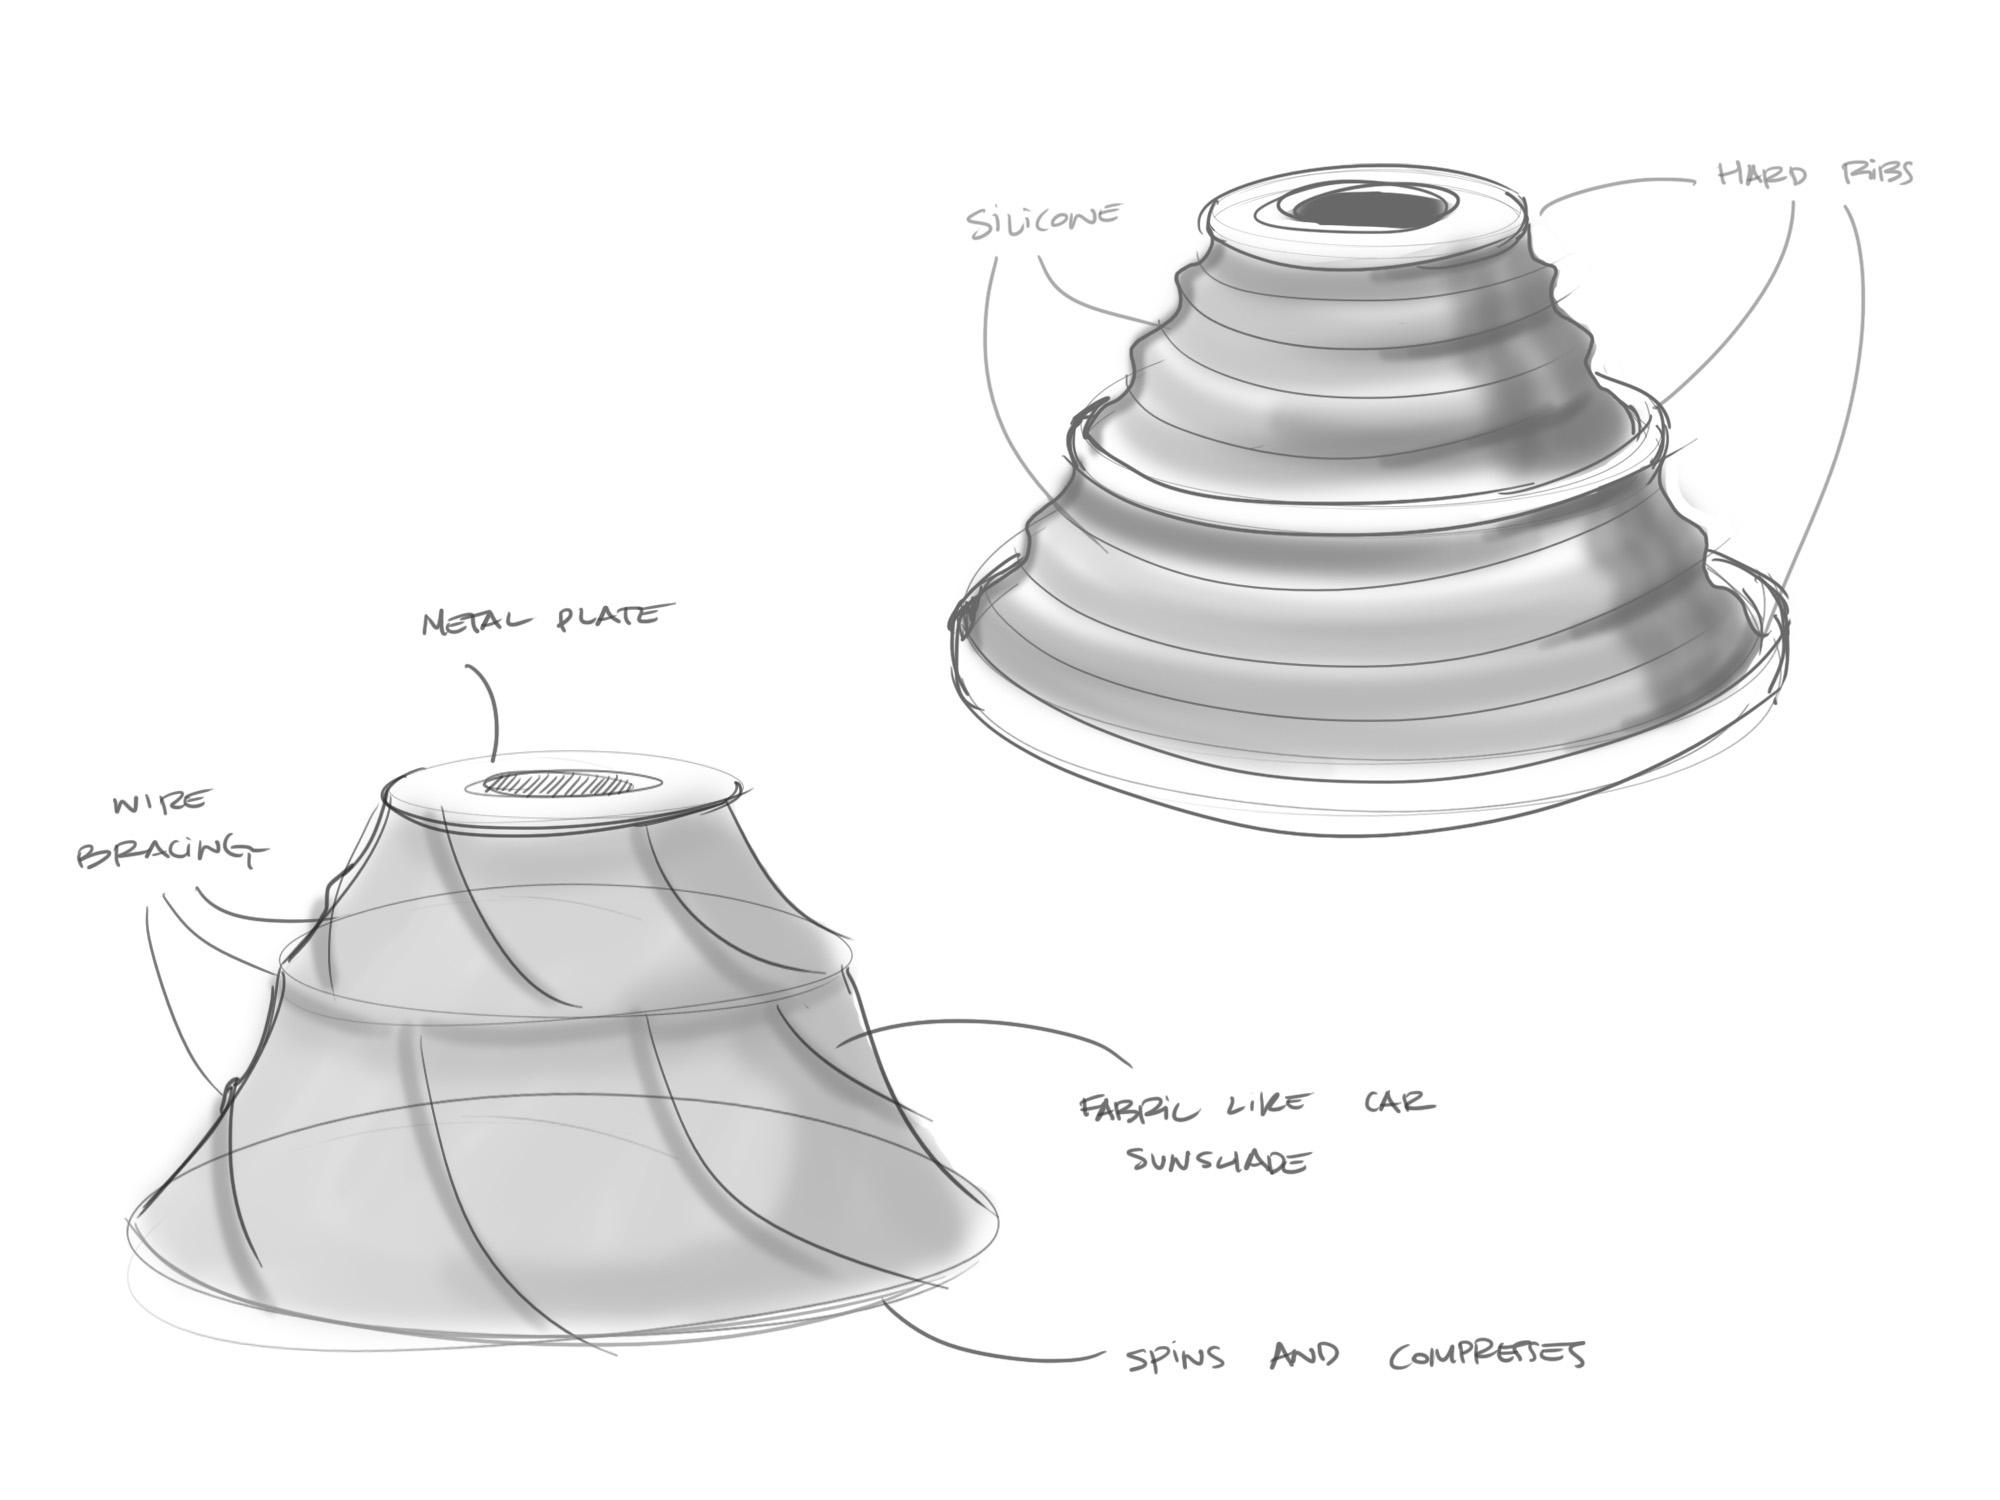 magmod beauty dish sketches.jpg